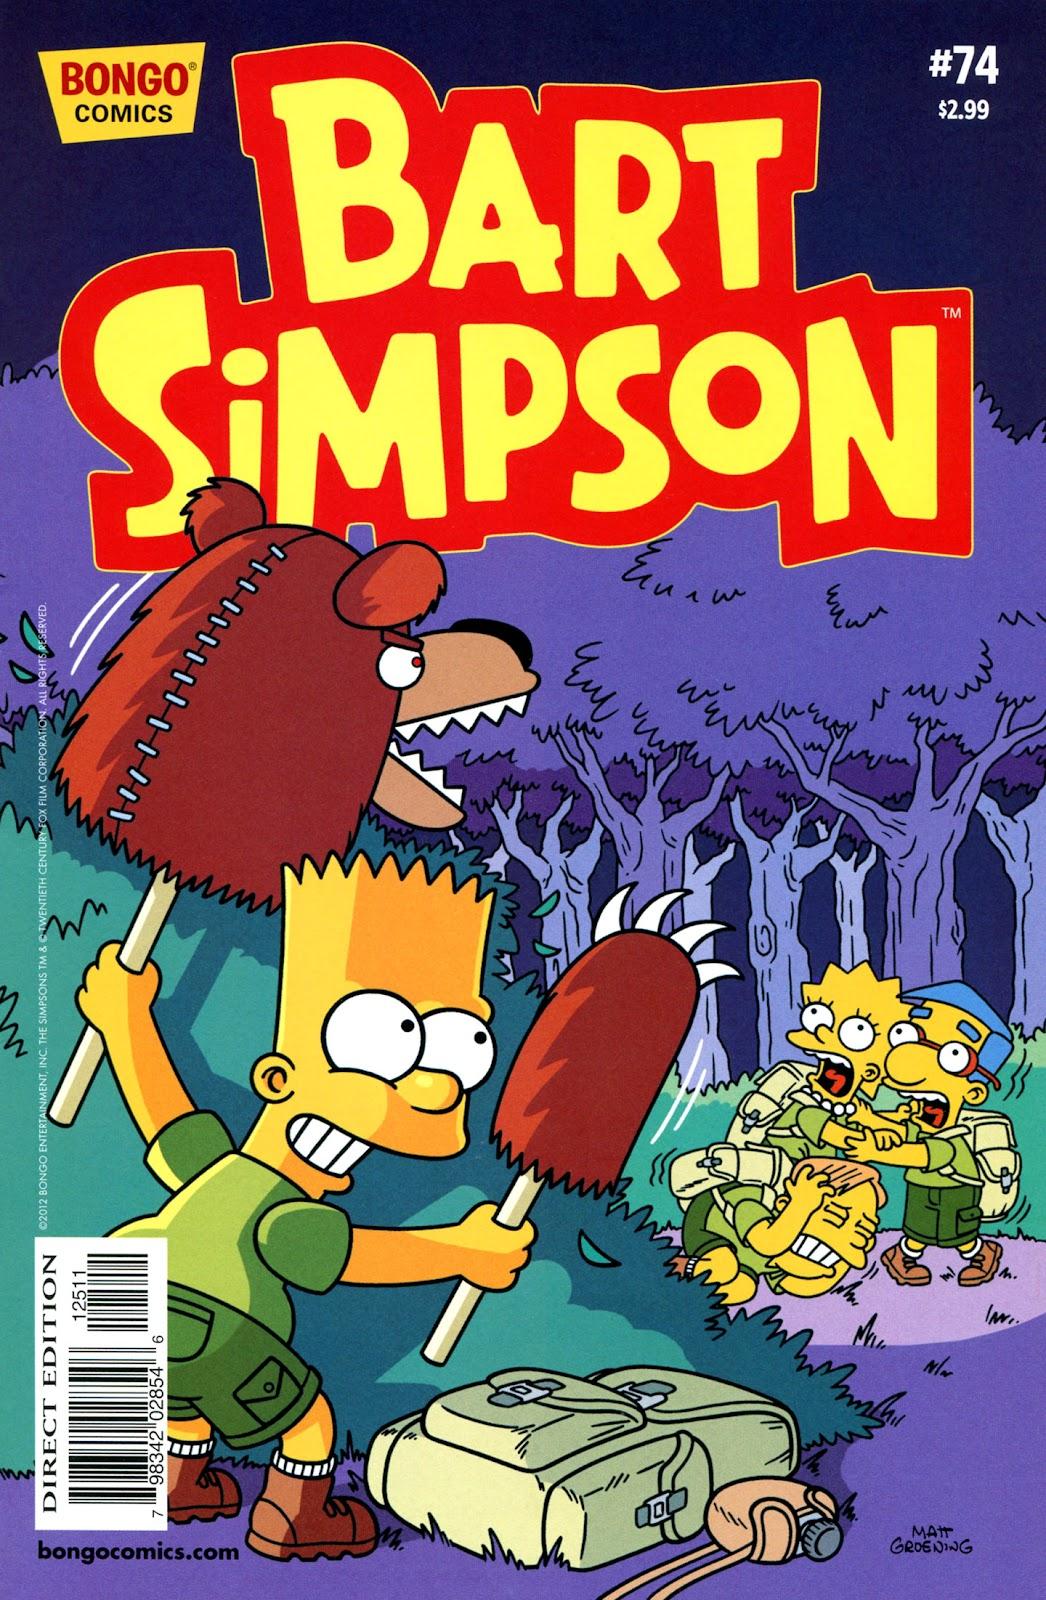 Simpsons Comics Presents Bart Simpson 74 Page 1